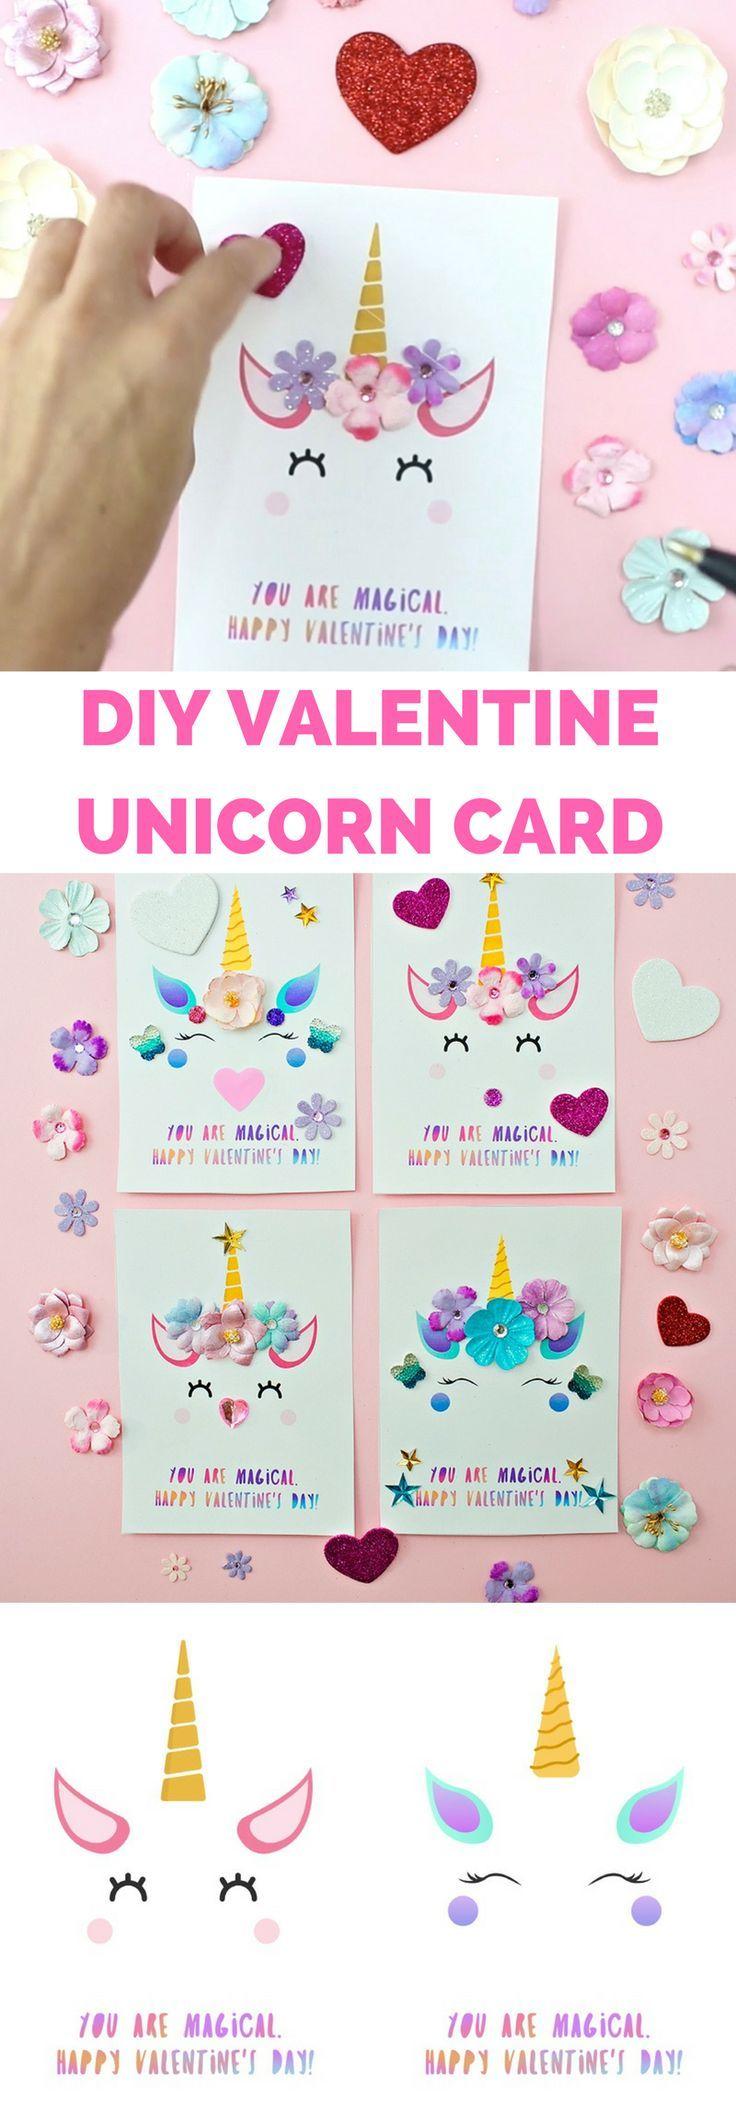 DIY Unicorn Valentine Cards. Printable template available. Cute handmade Valentine card. #unicornparty #unicornio #valentinecraft #valentinecard